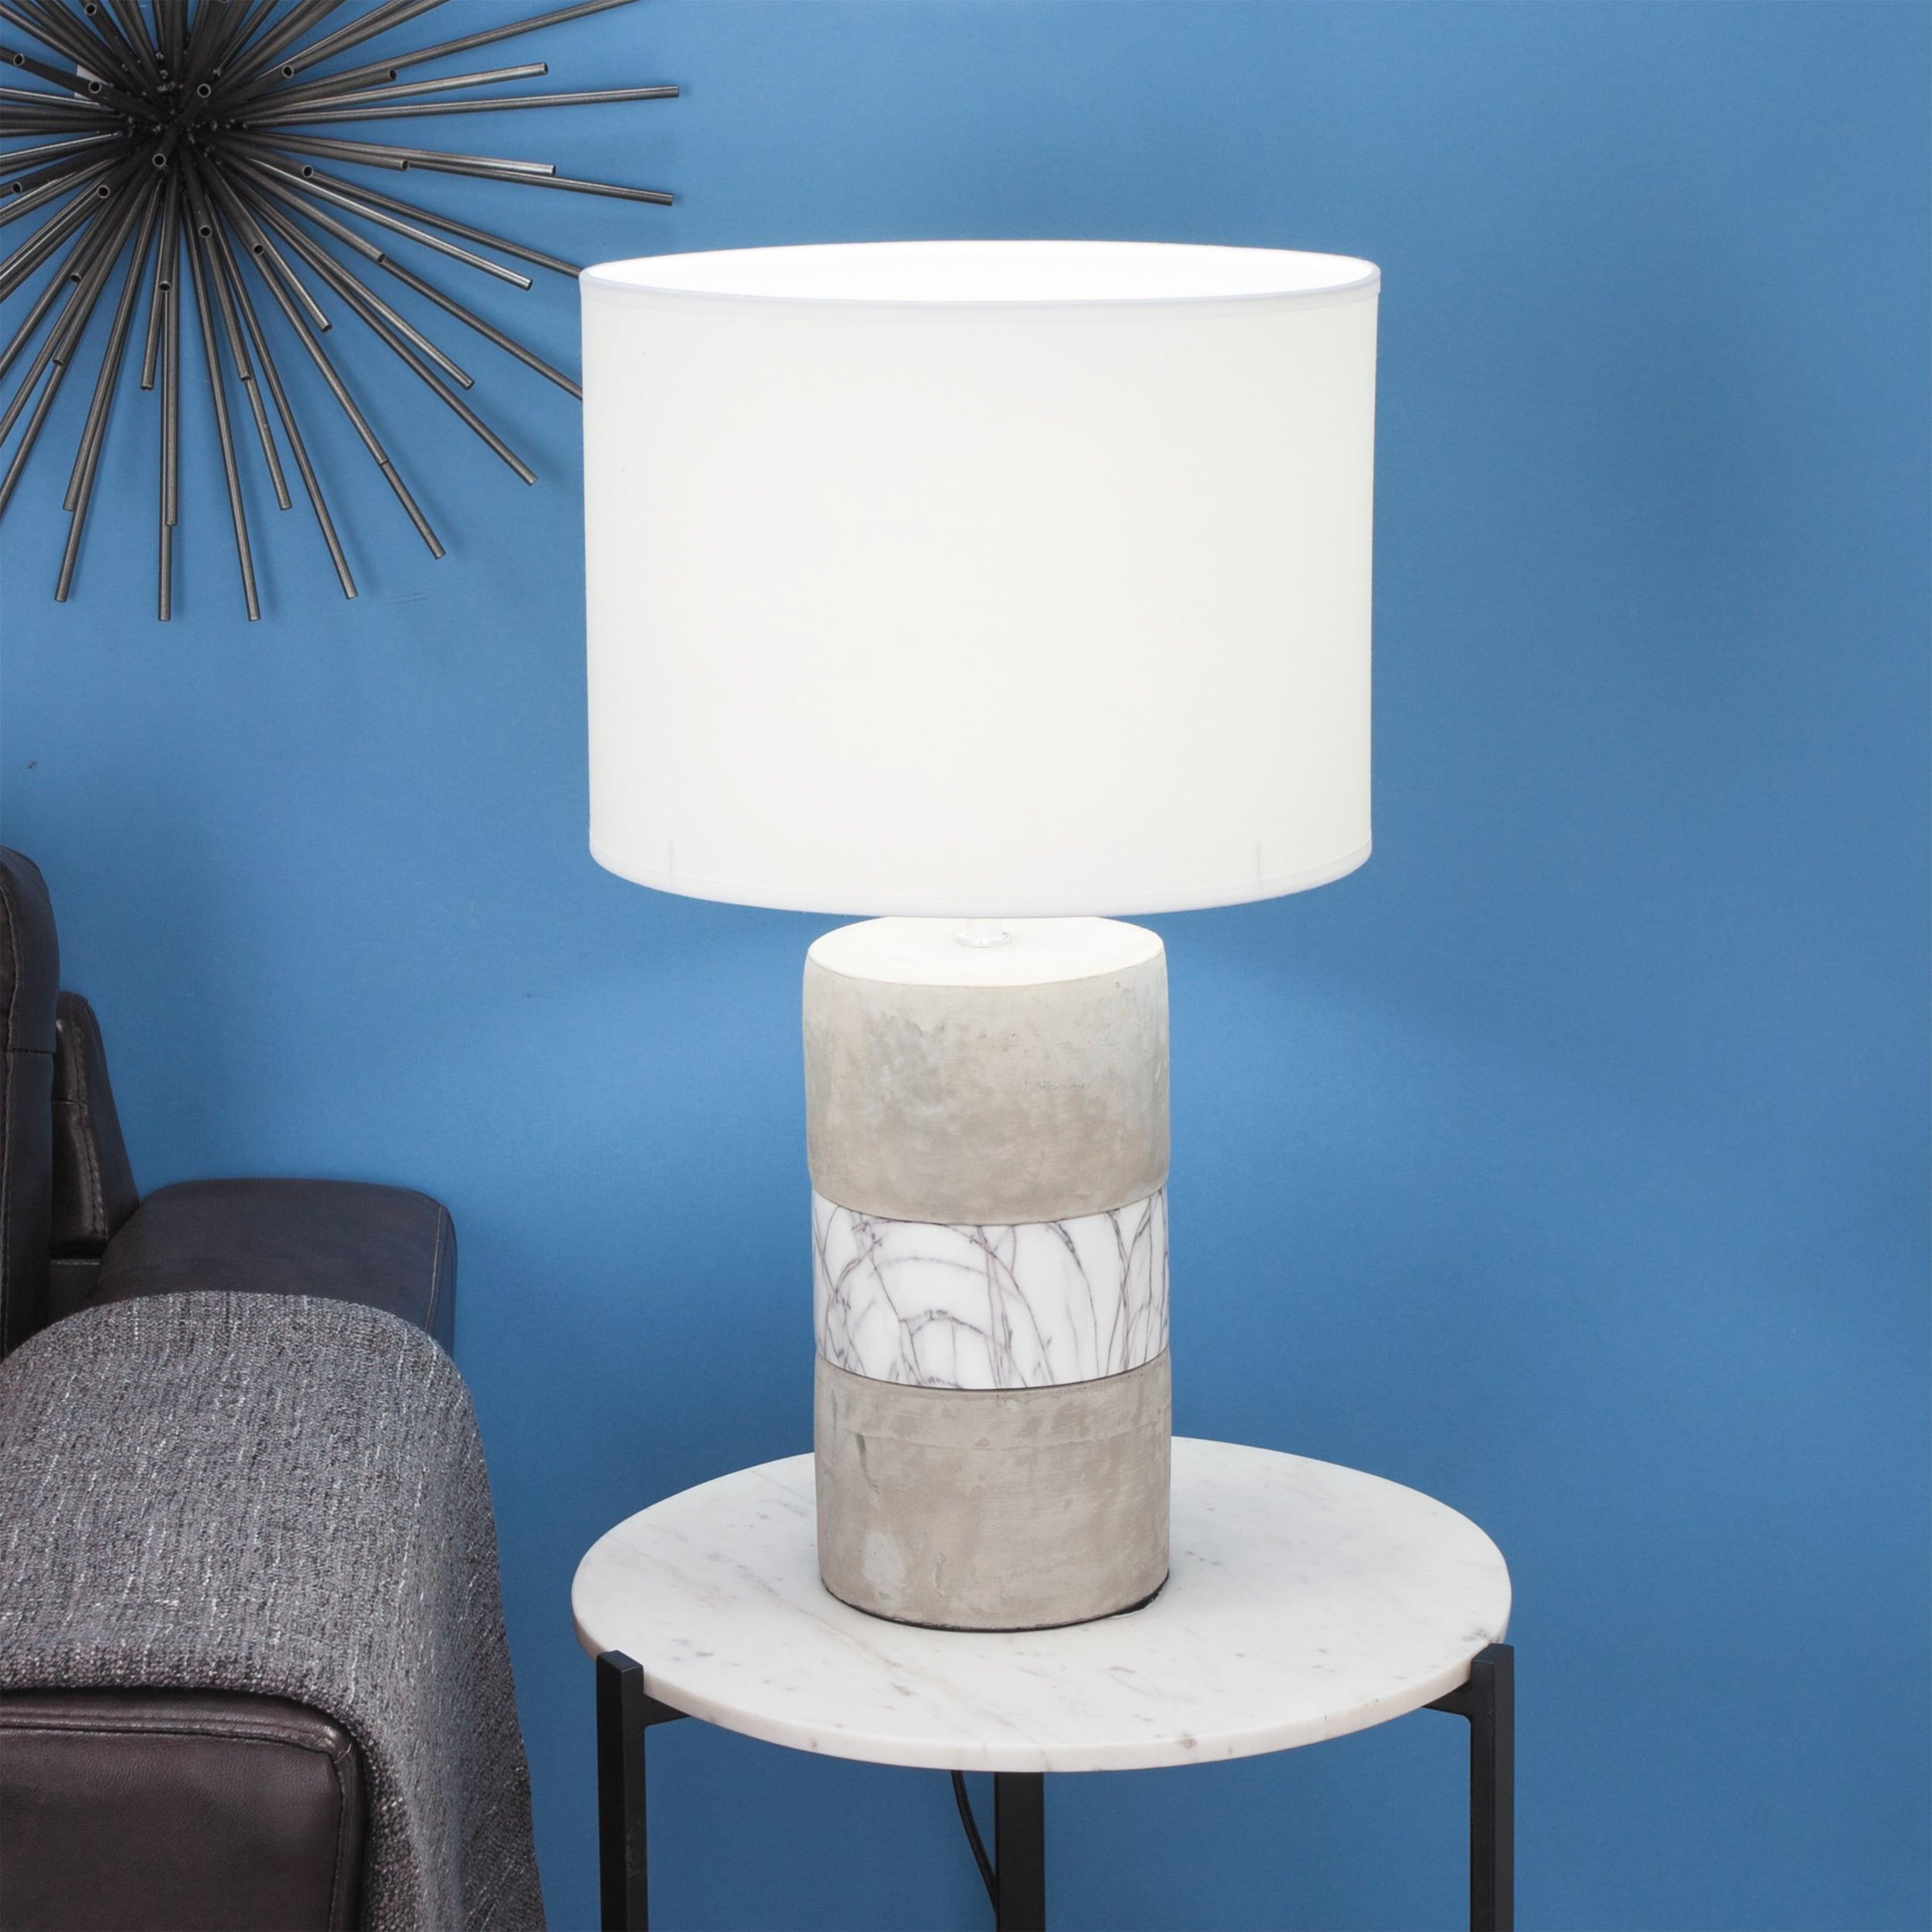 LED Desk Lamp Table Reading Lamp Clip Lamp Fashion Novelty Gift for Student#TA